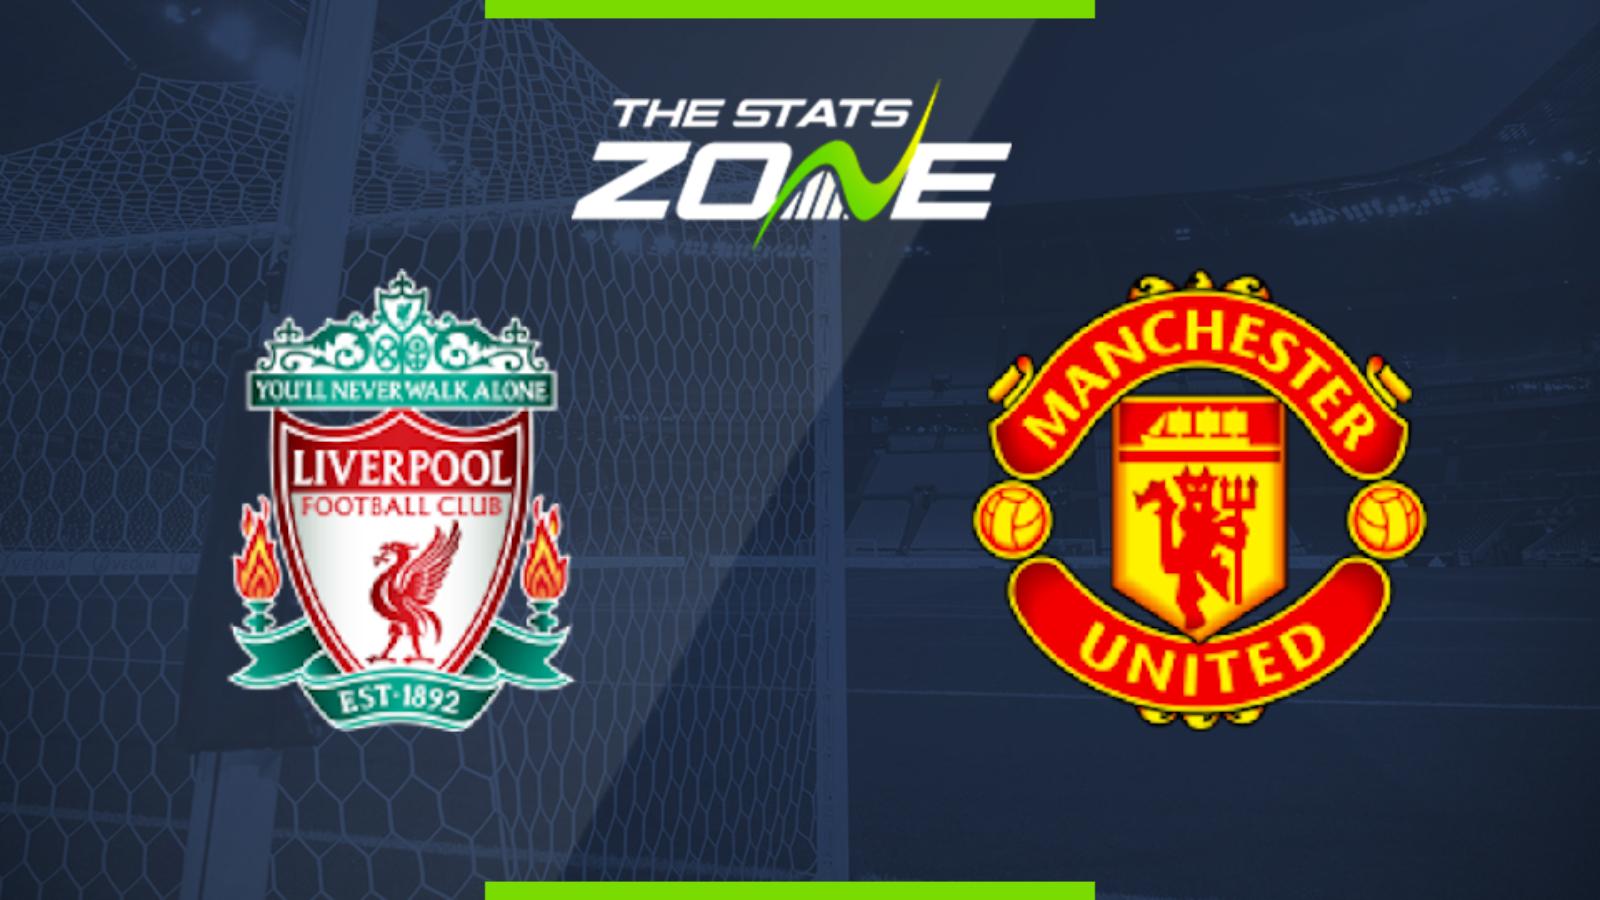 2019 20 Premier League Liverpool Vs Man Utd Preview Prediction The Stats Zone